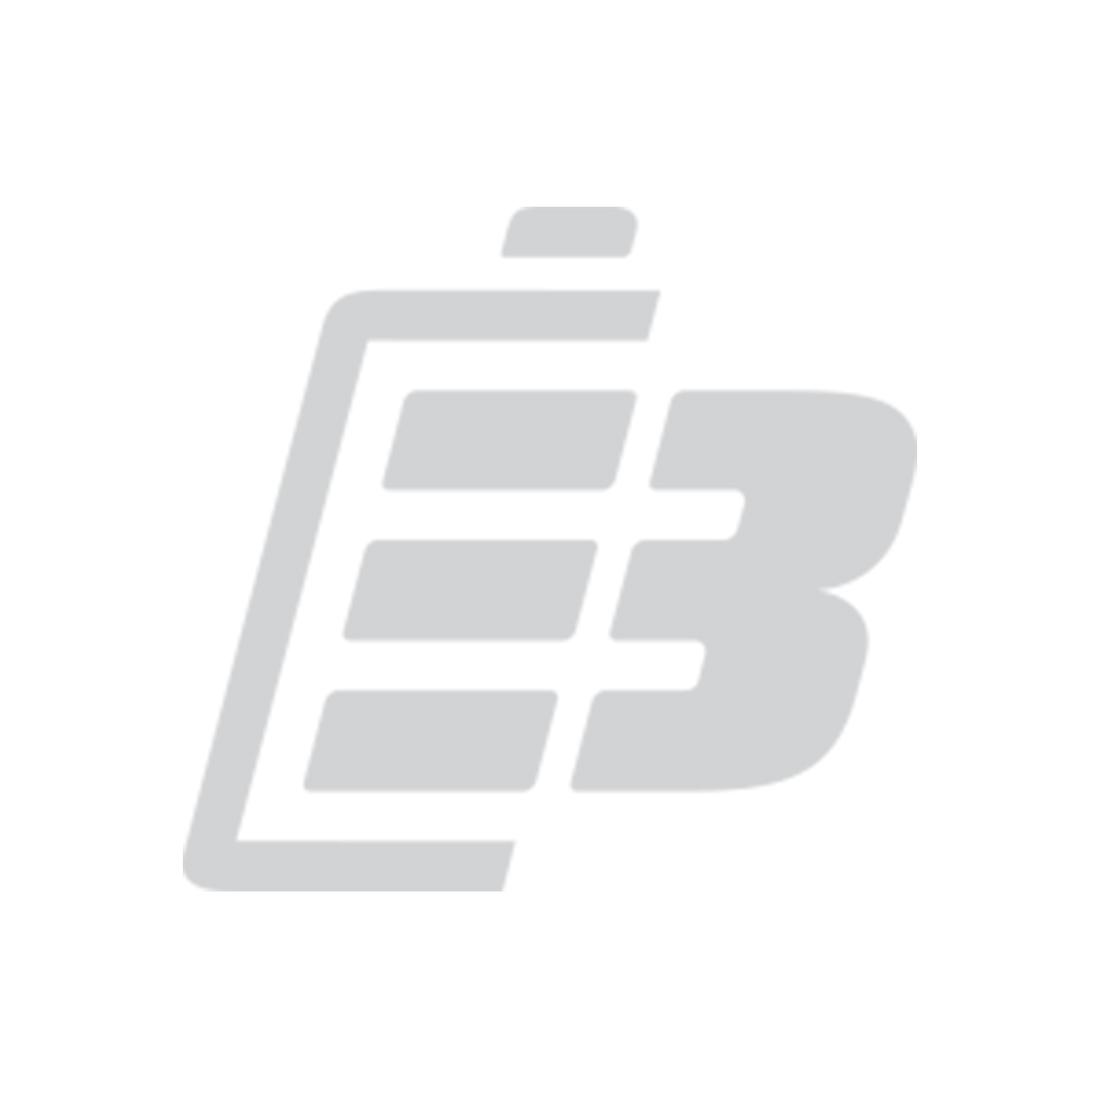 Smartphone battery Samsung Galaxy S5_1